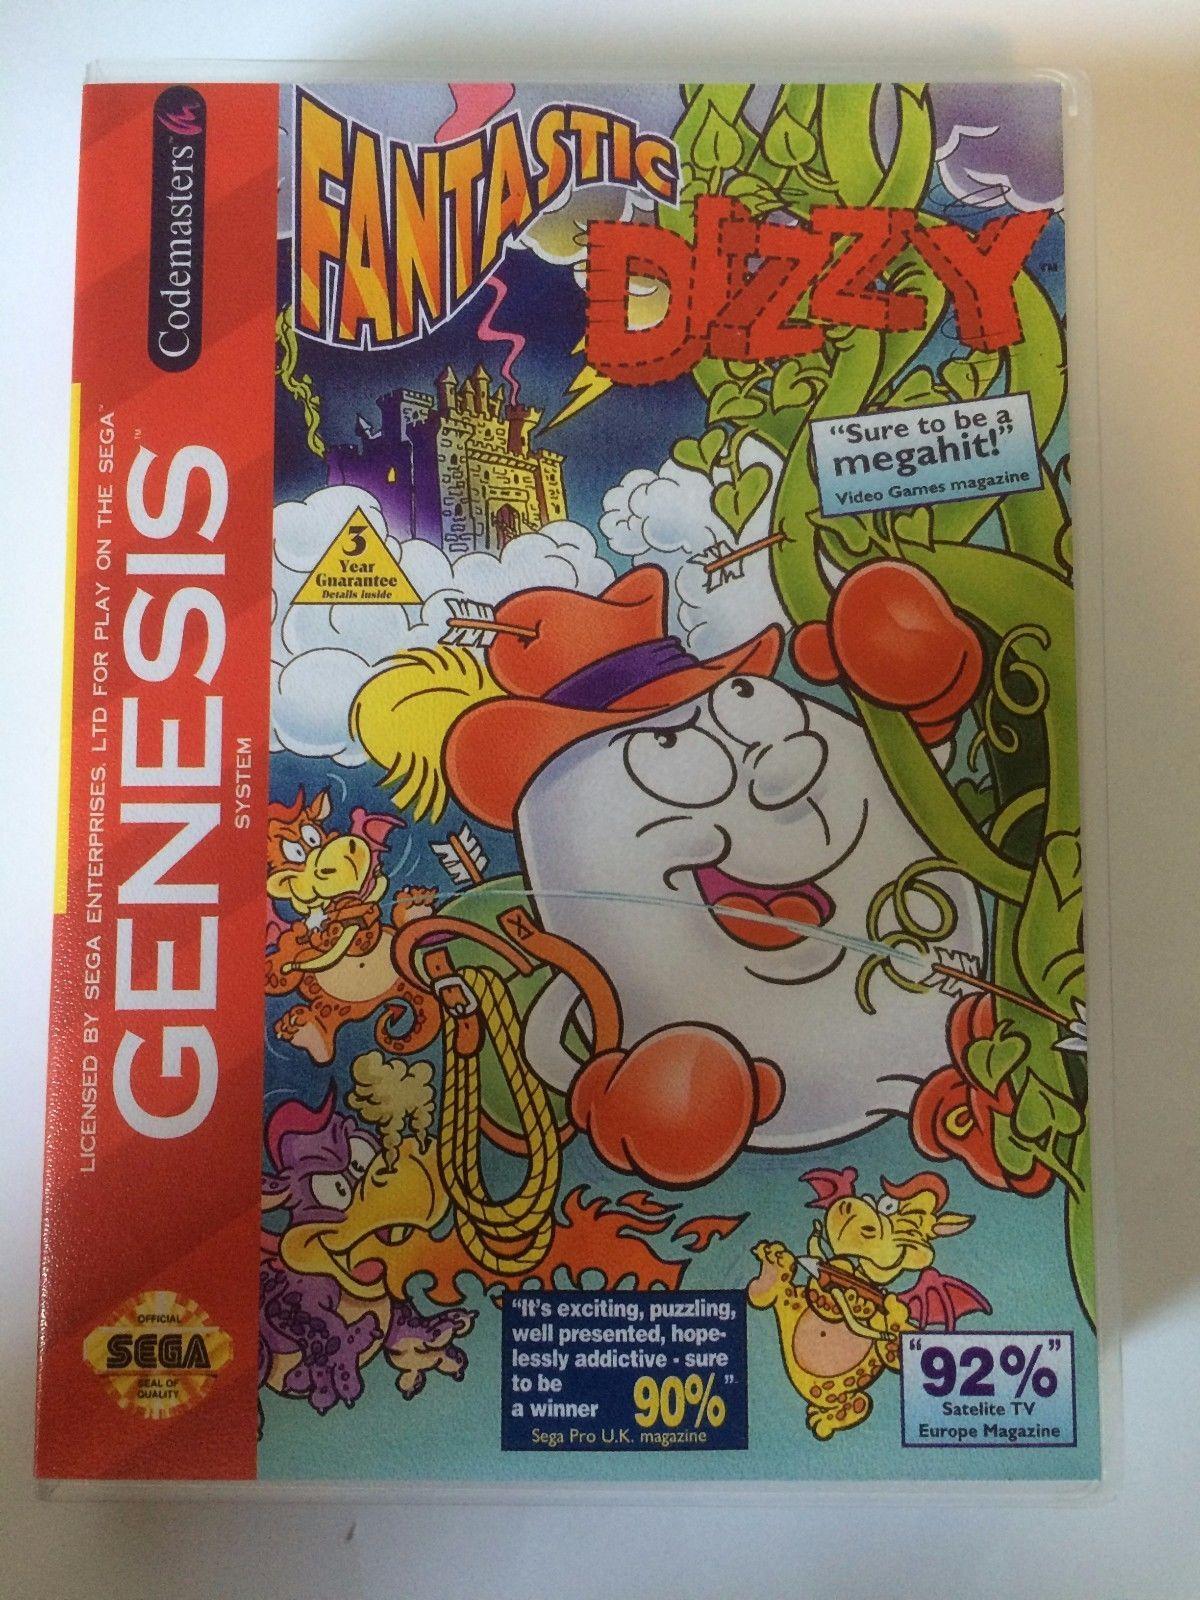 Fantastic Dizzy - Sega Genesis - Replacement Case - No Game